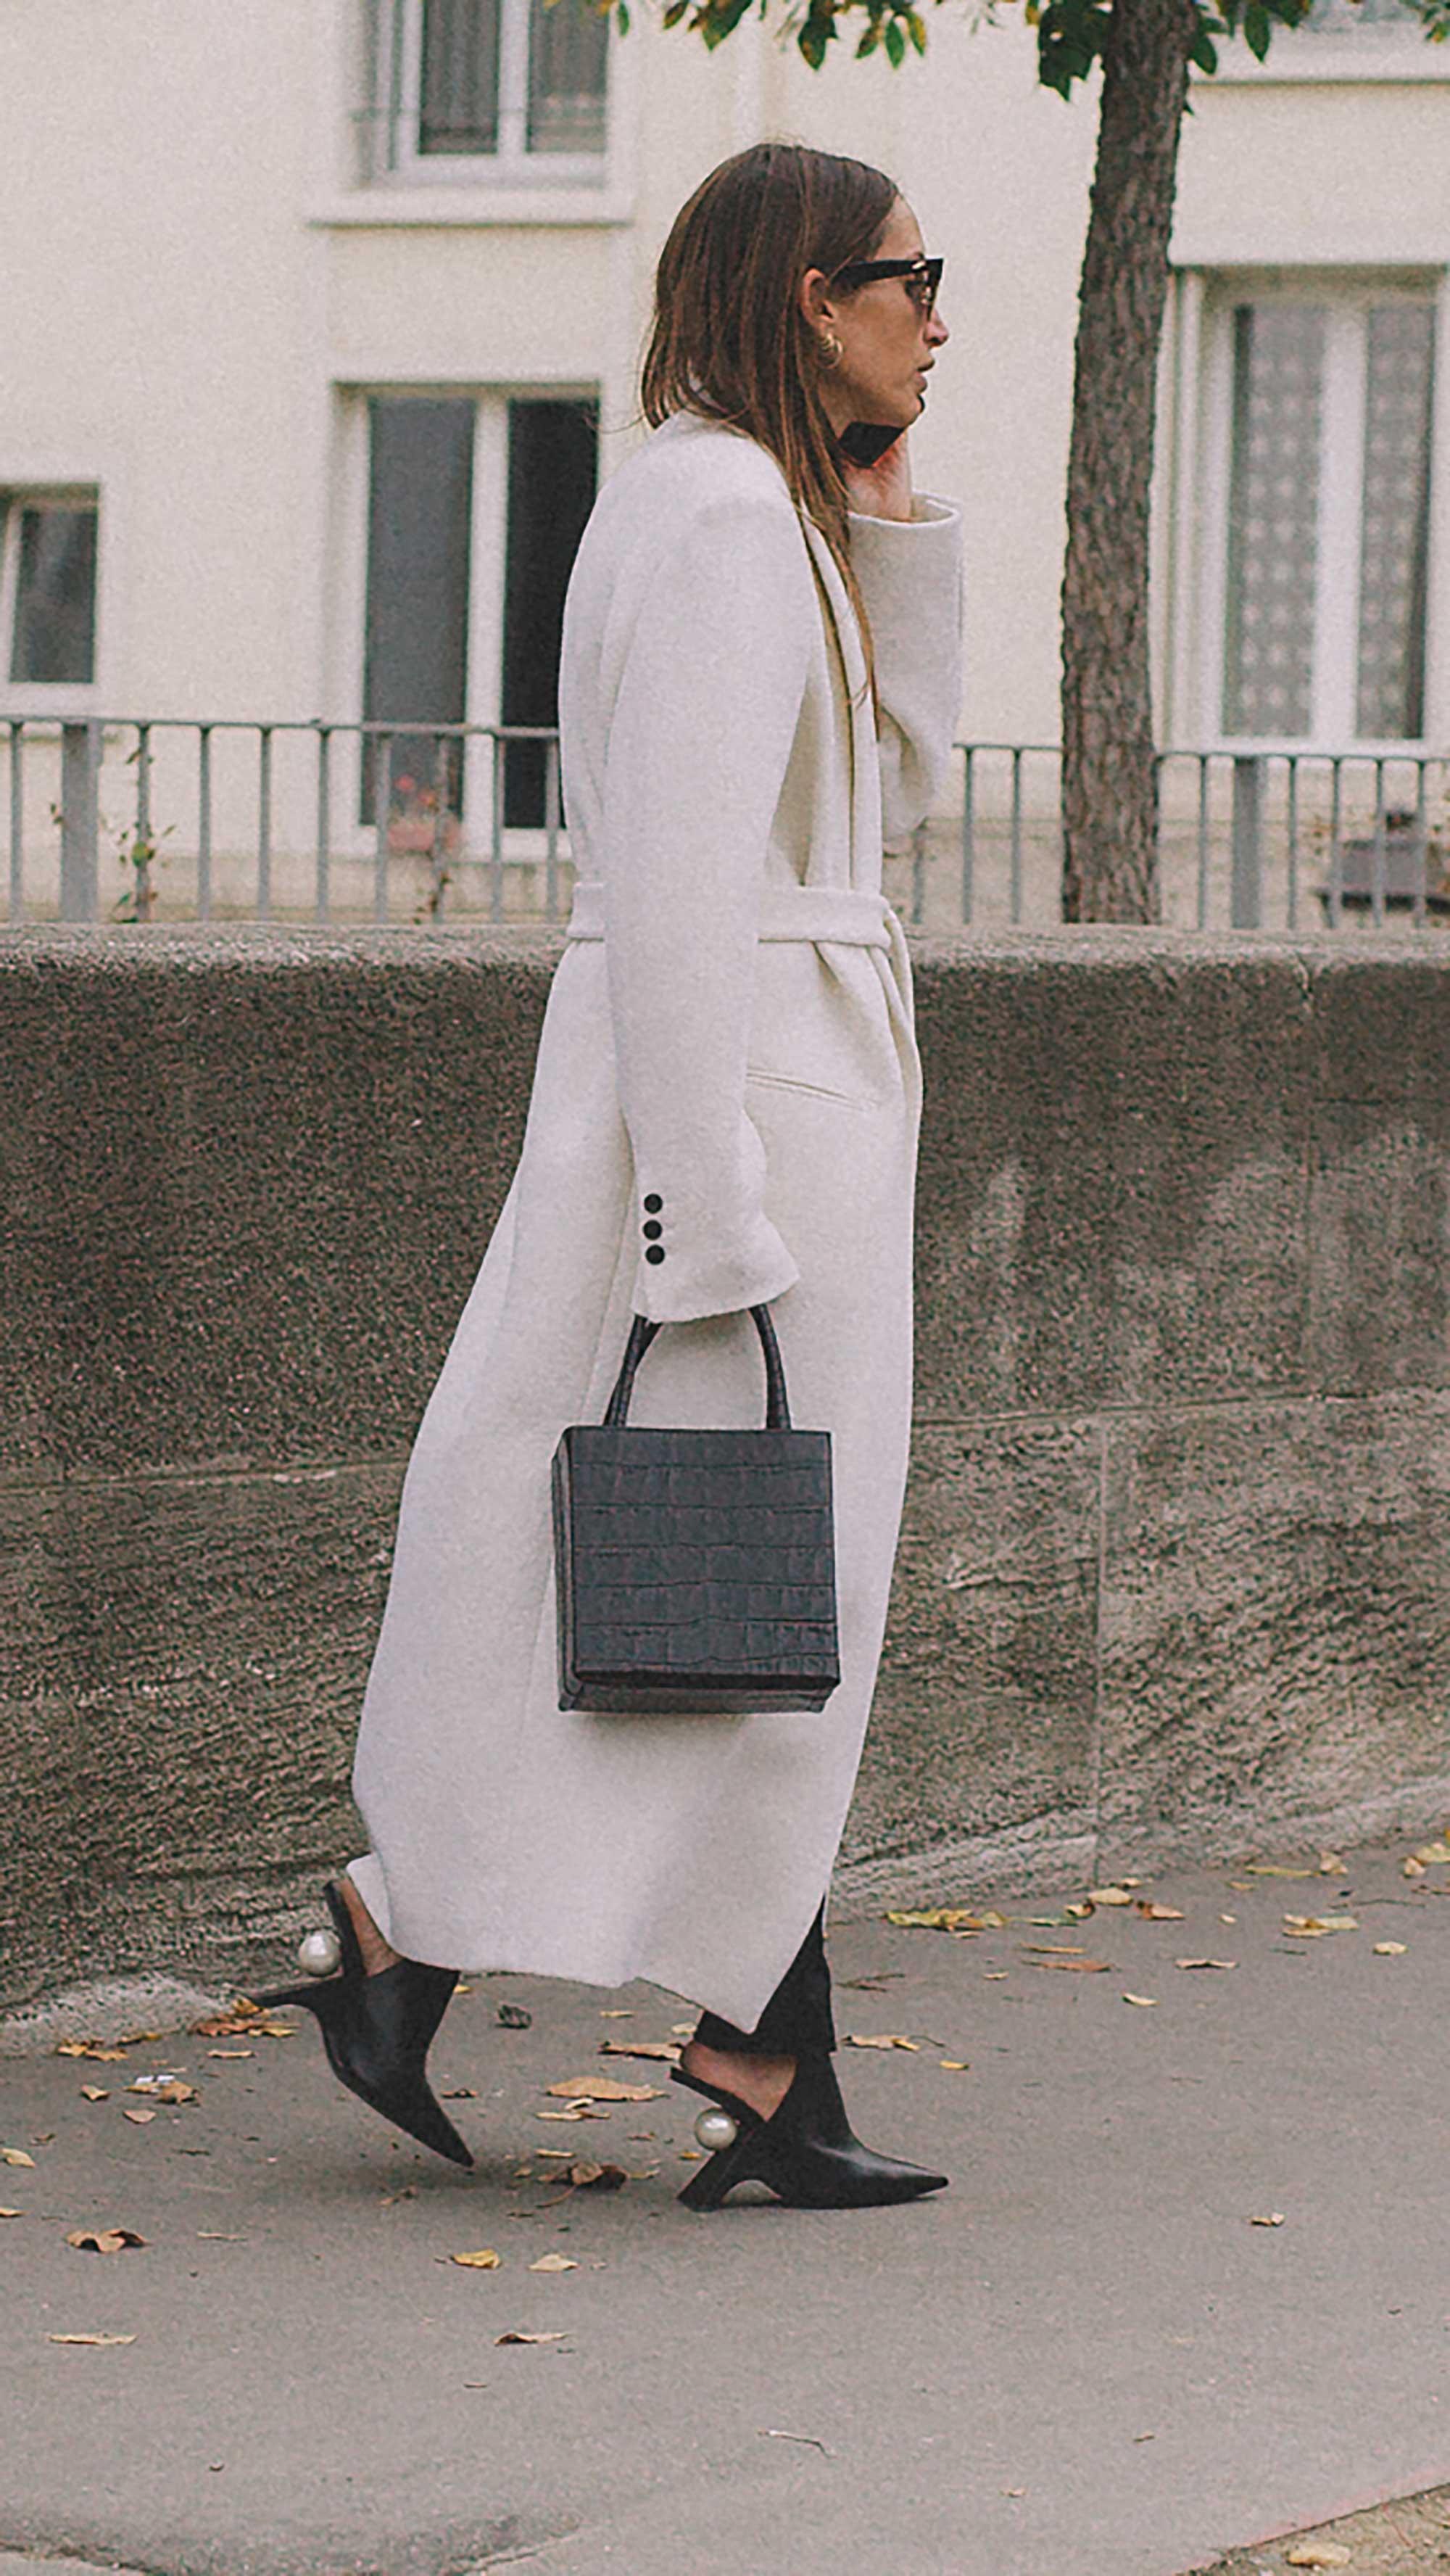 Best outfits of Paris Fashion Week street style 2019 day three PFW SS20 Photo by @J2martinez Jose J. Martinez -2.jpg